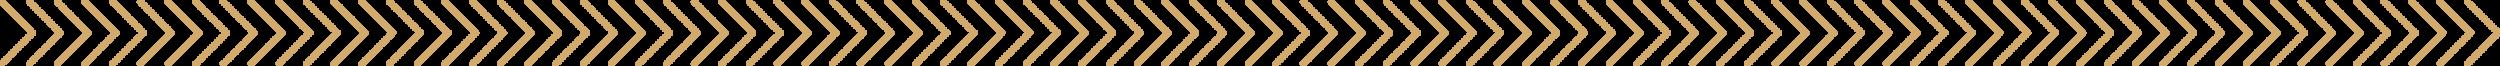 Tribal Shaman-Design-Kit-44.png